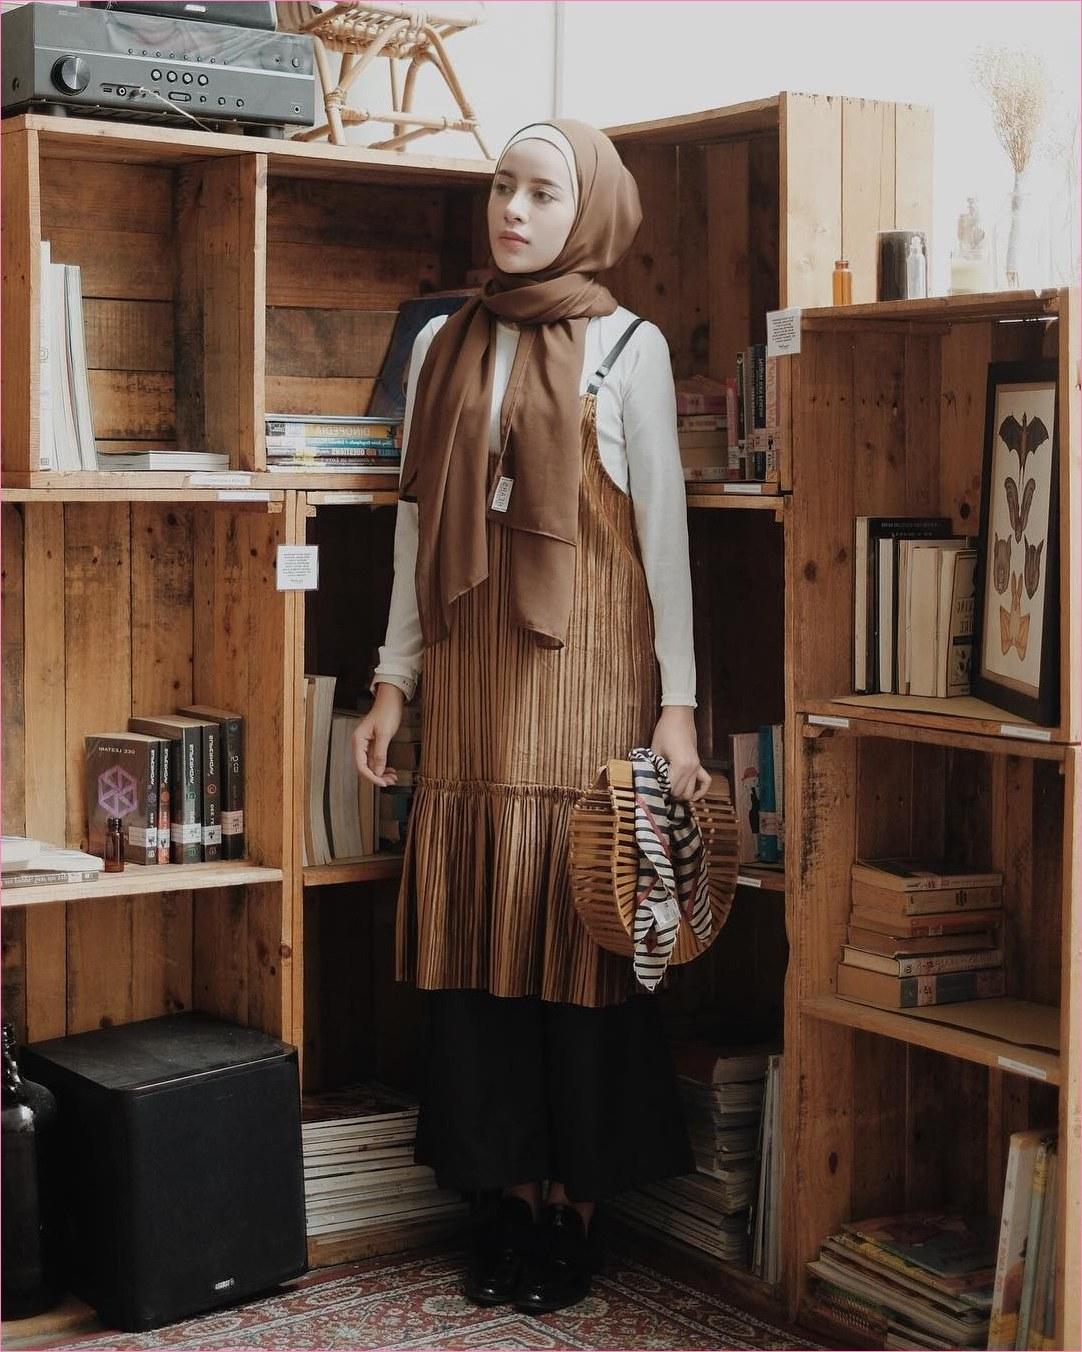 Design Model Baju Lebaran Wanita 2019 X8d1 80 Model Baju Lebaran Terbaru 2019 Muslimah Trendy Model